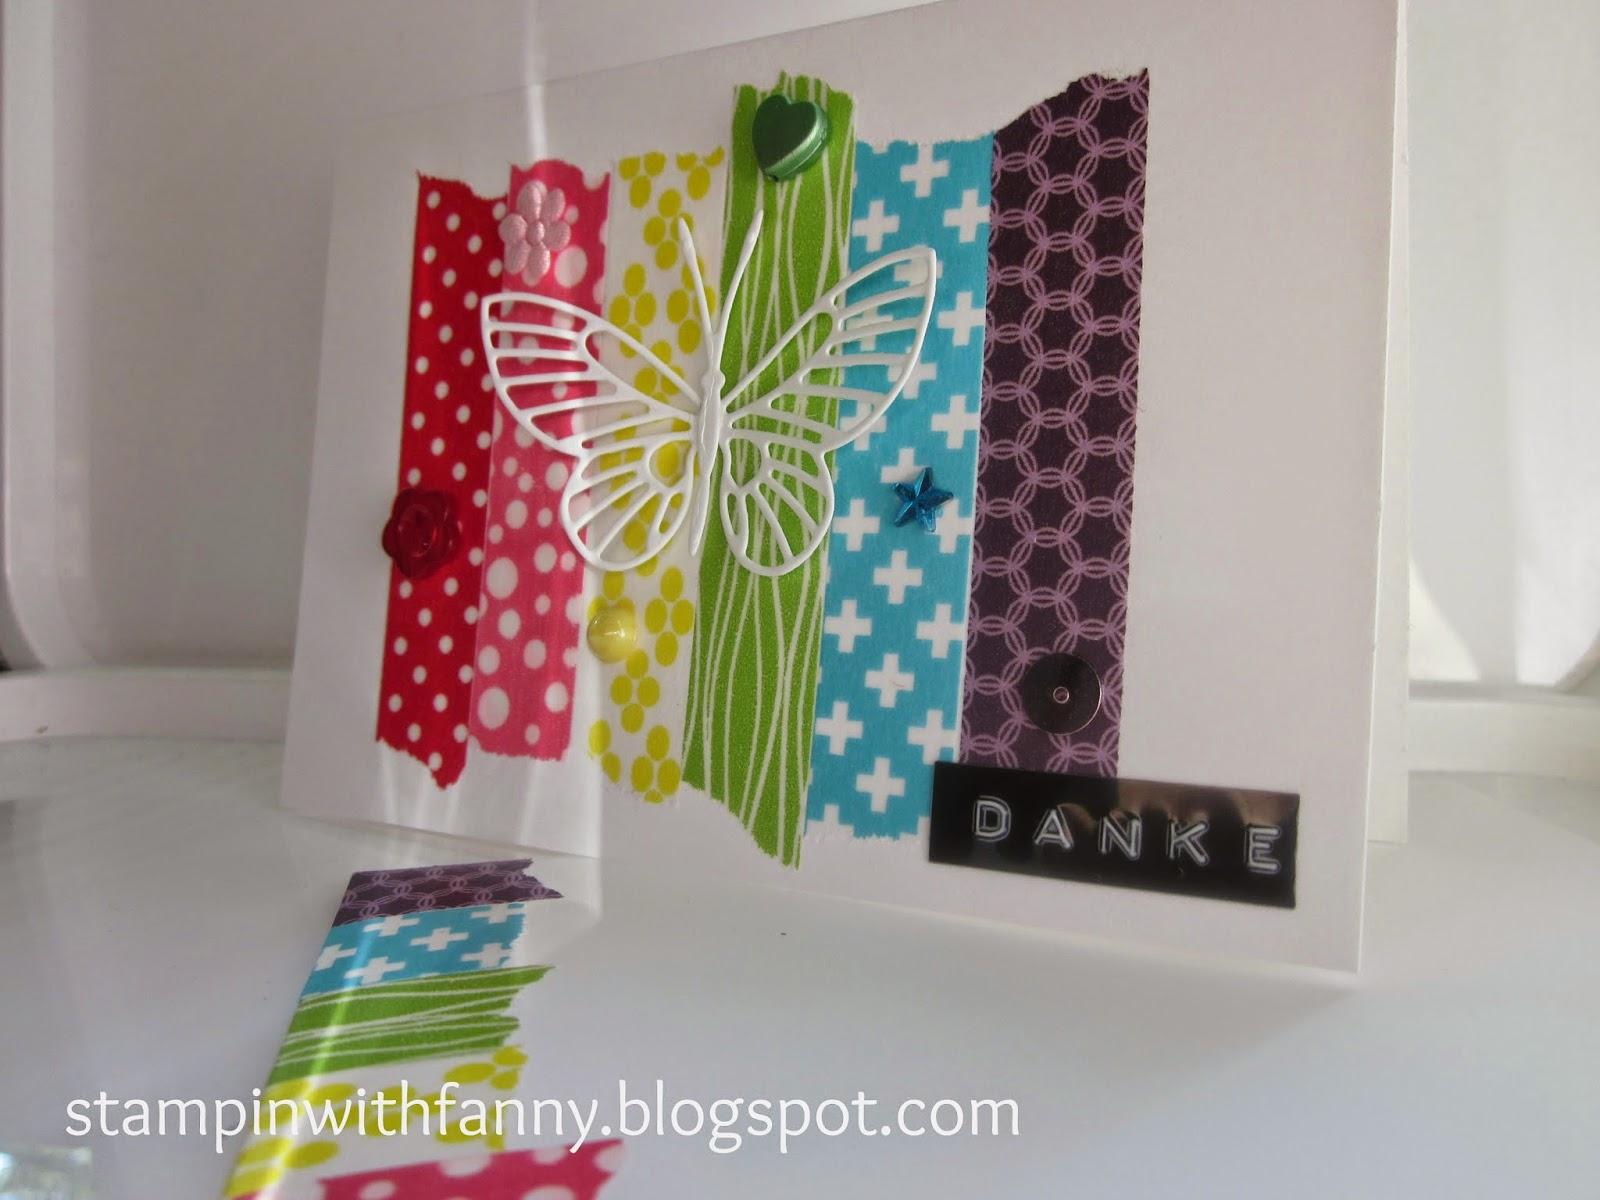 stampin with fanny ganz viele bunte washi tape karten. Black Bedroom Furniture Sets. Home Design Ideas